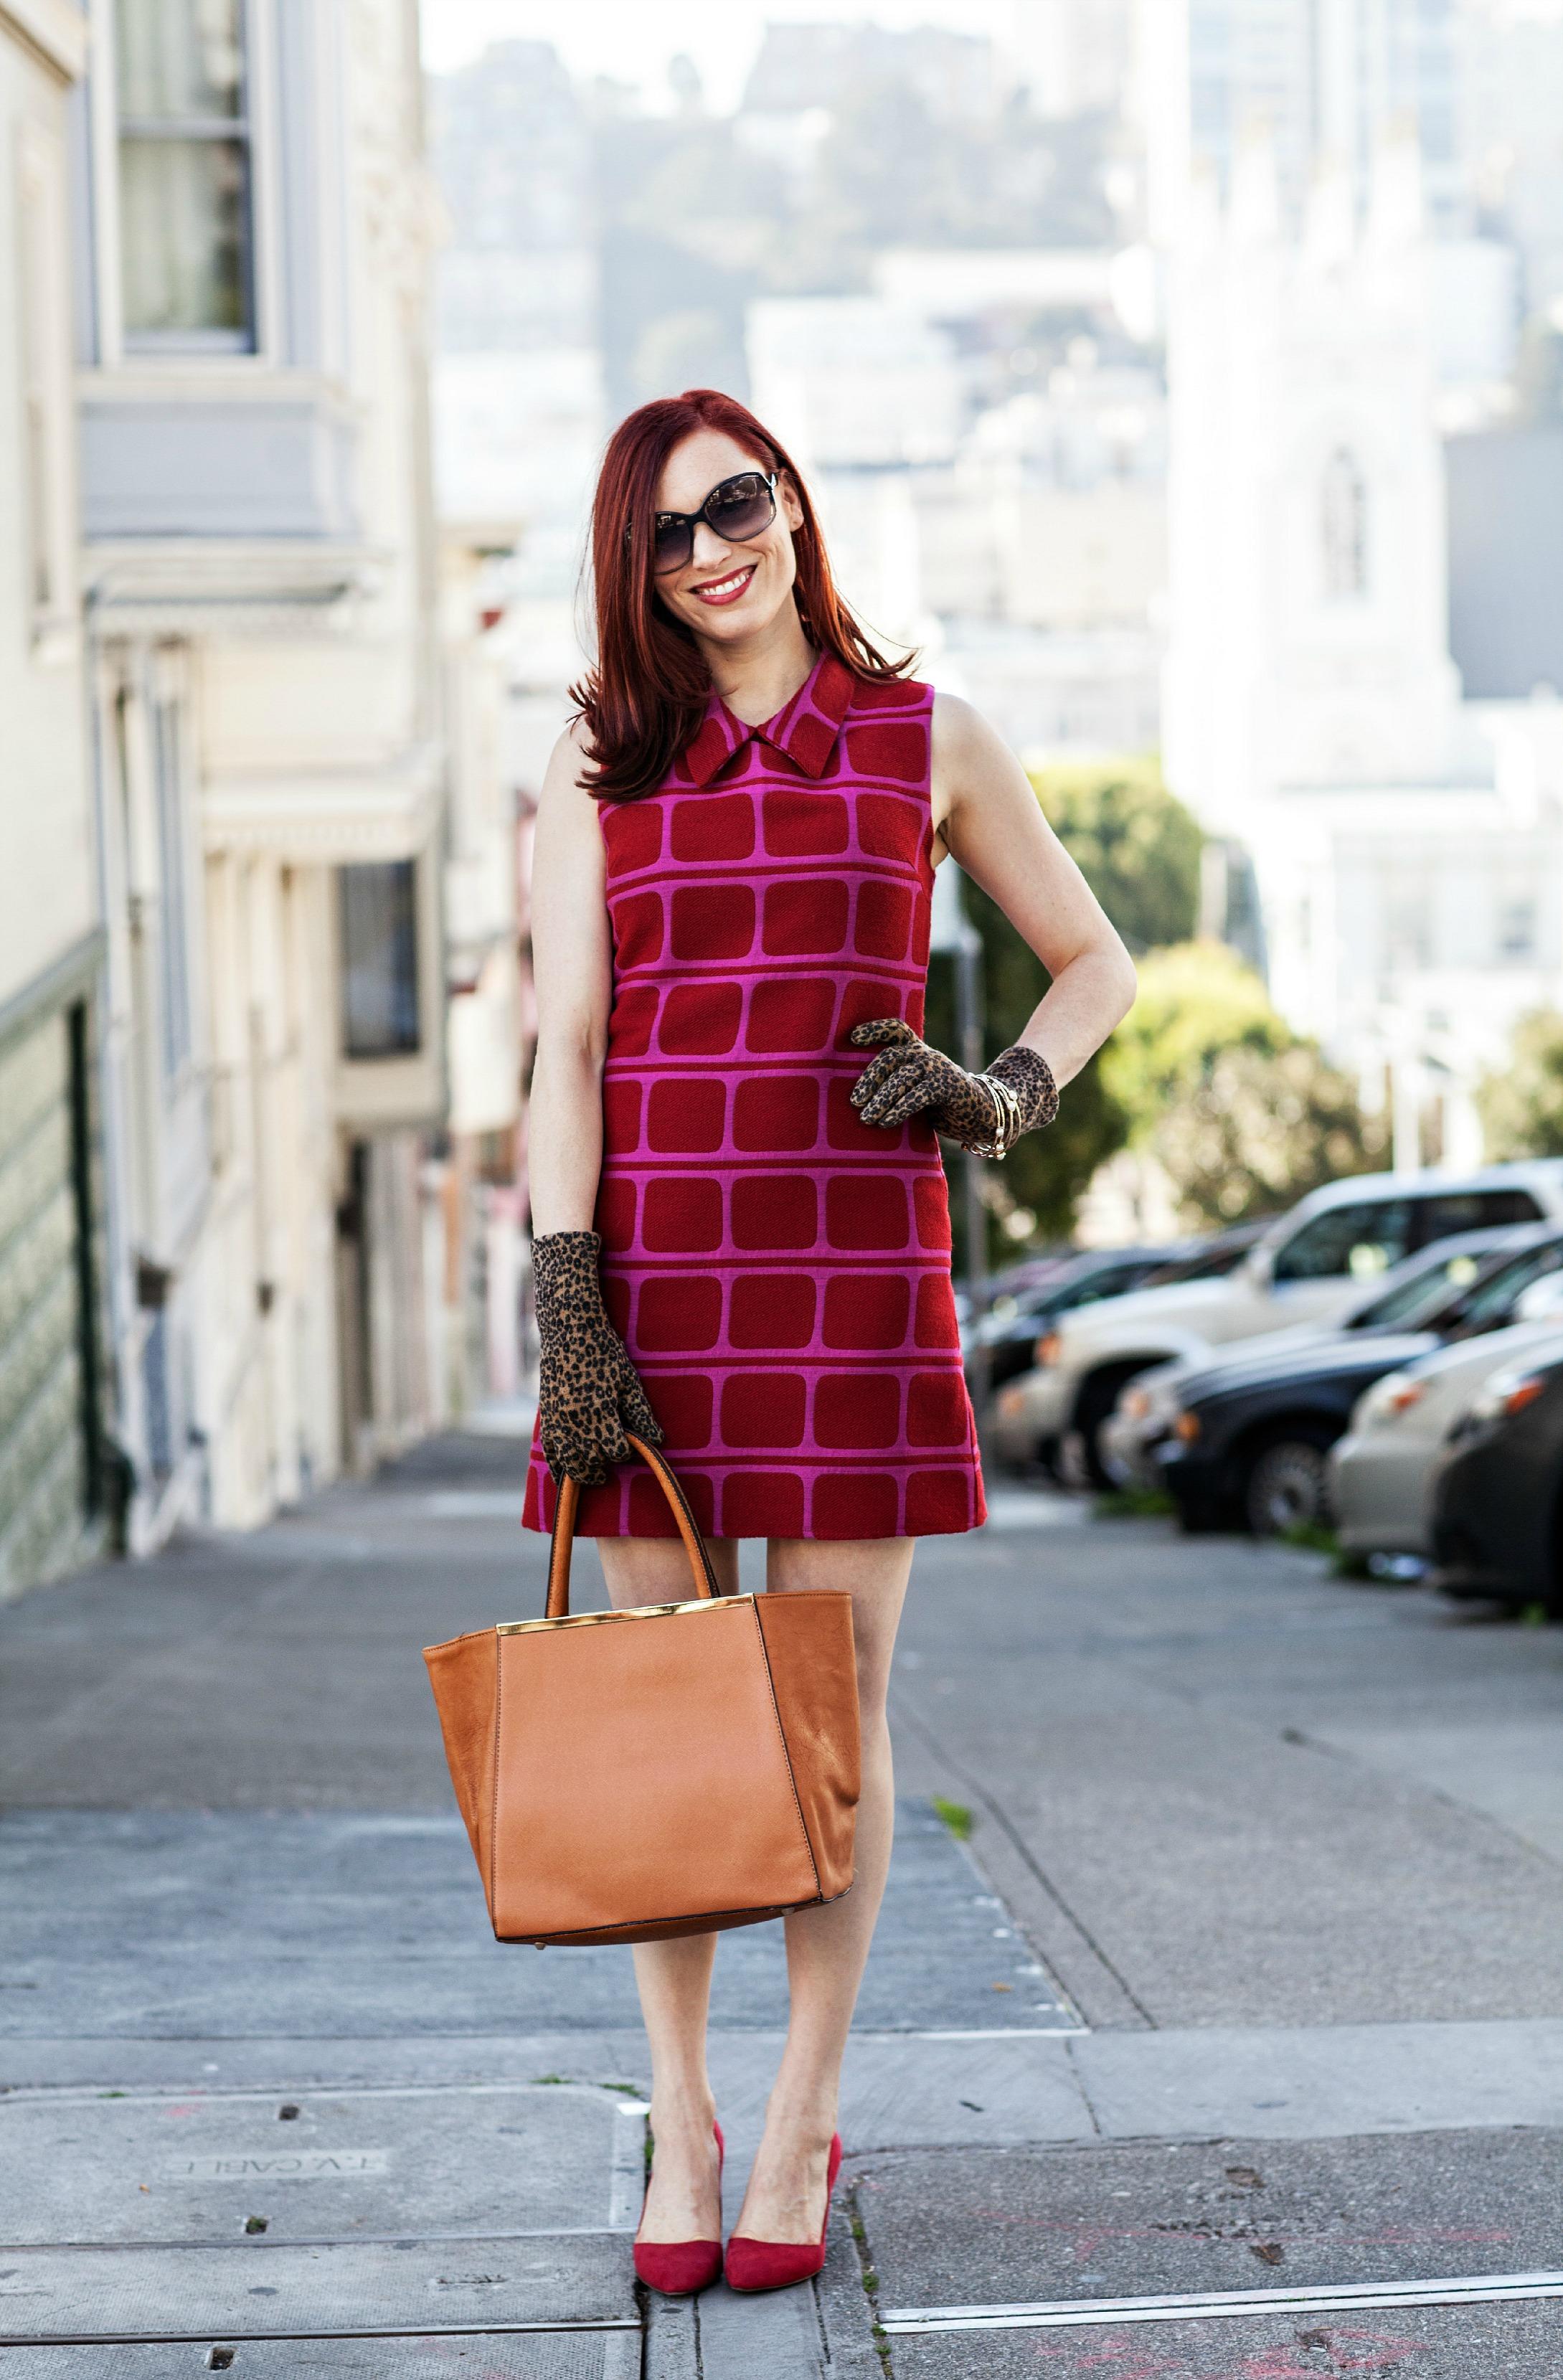 San francisco street fashion 1